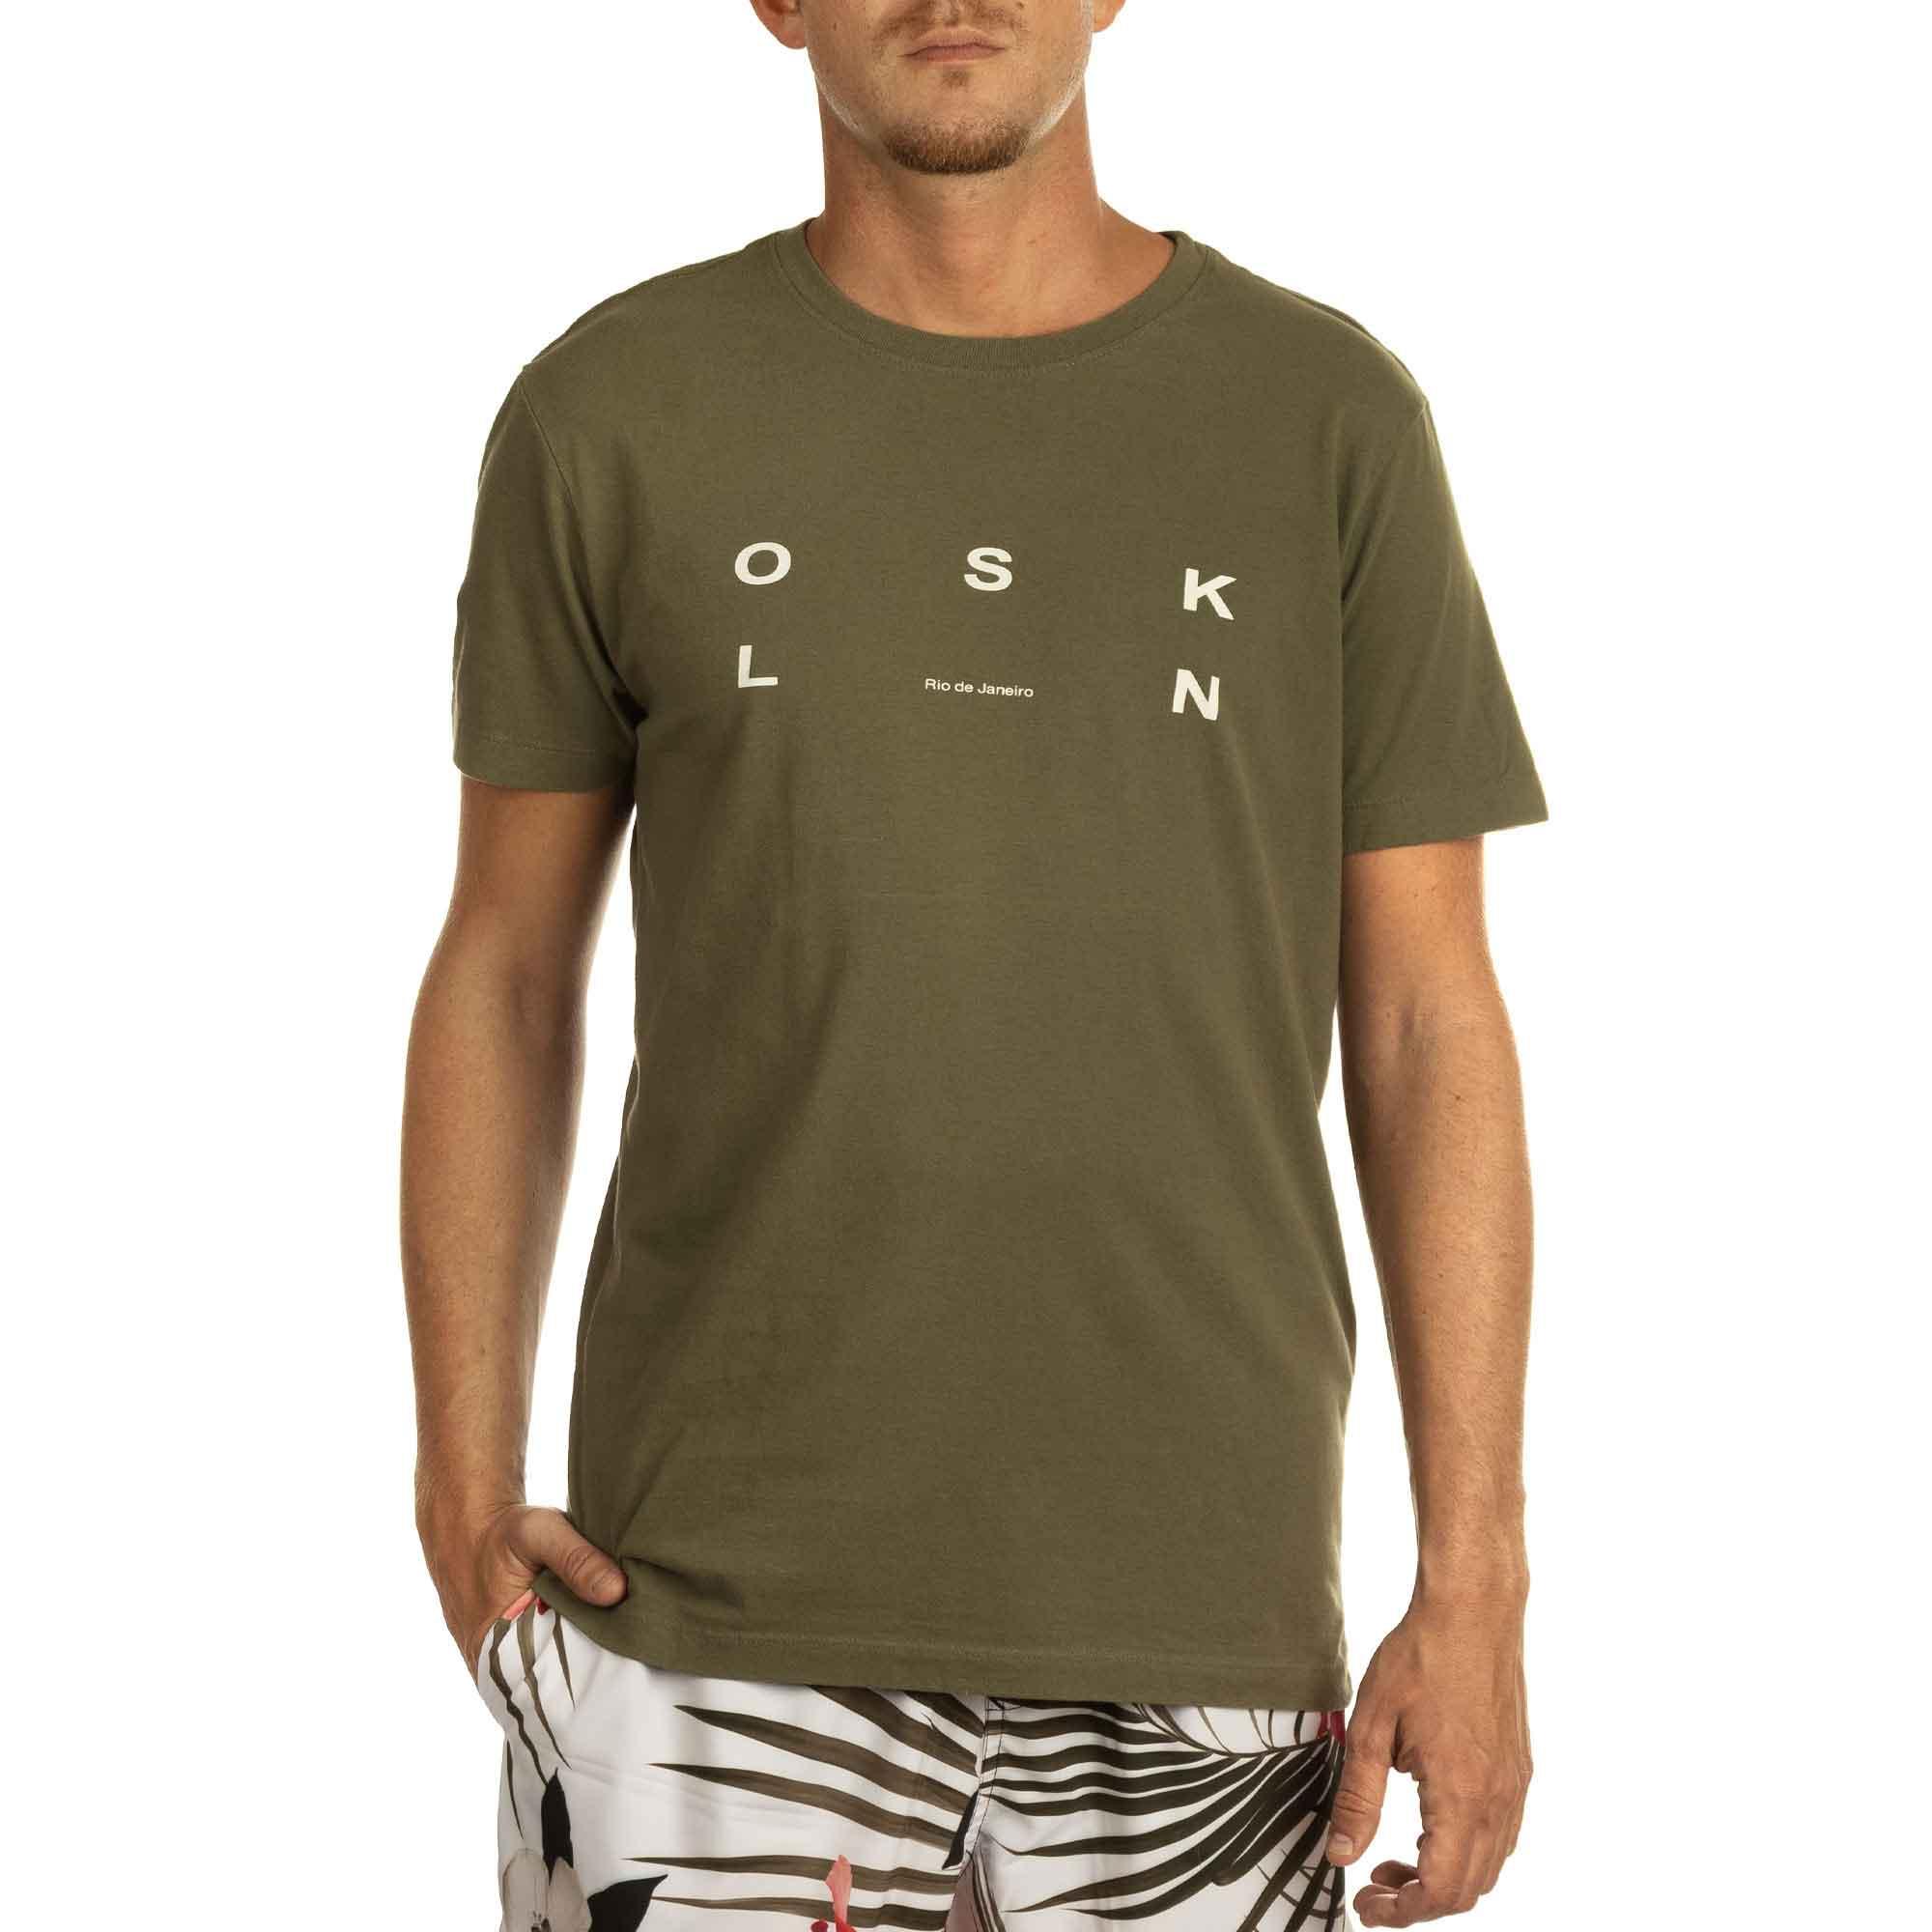 Osklen Camiseta Vintage Osk RJ Manga Curta Masculino Verde